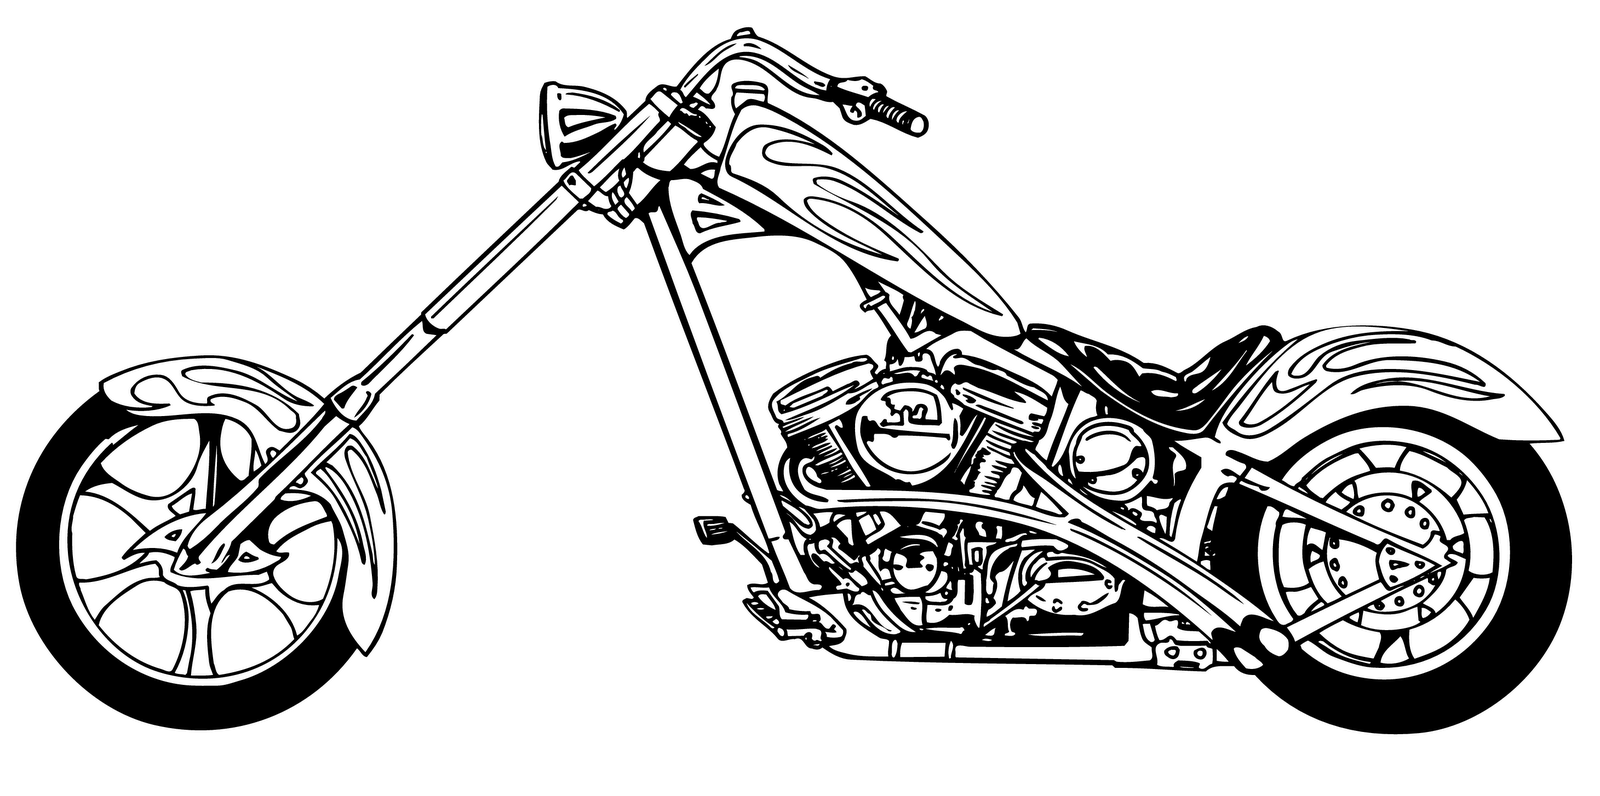 Harley Motorcycle Clip Art .-Harley motorcycle clip art .-14